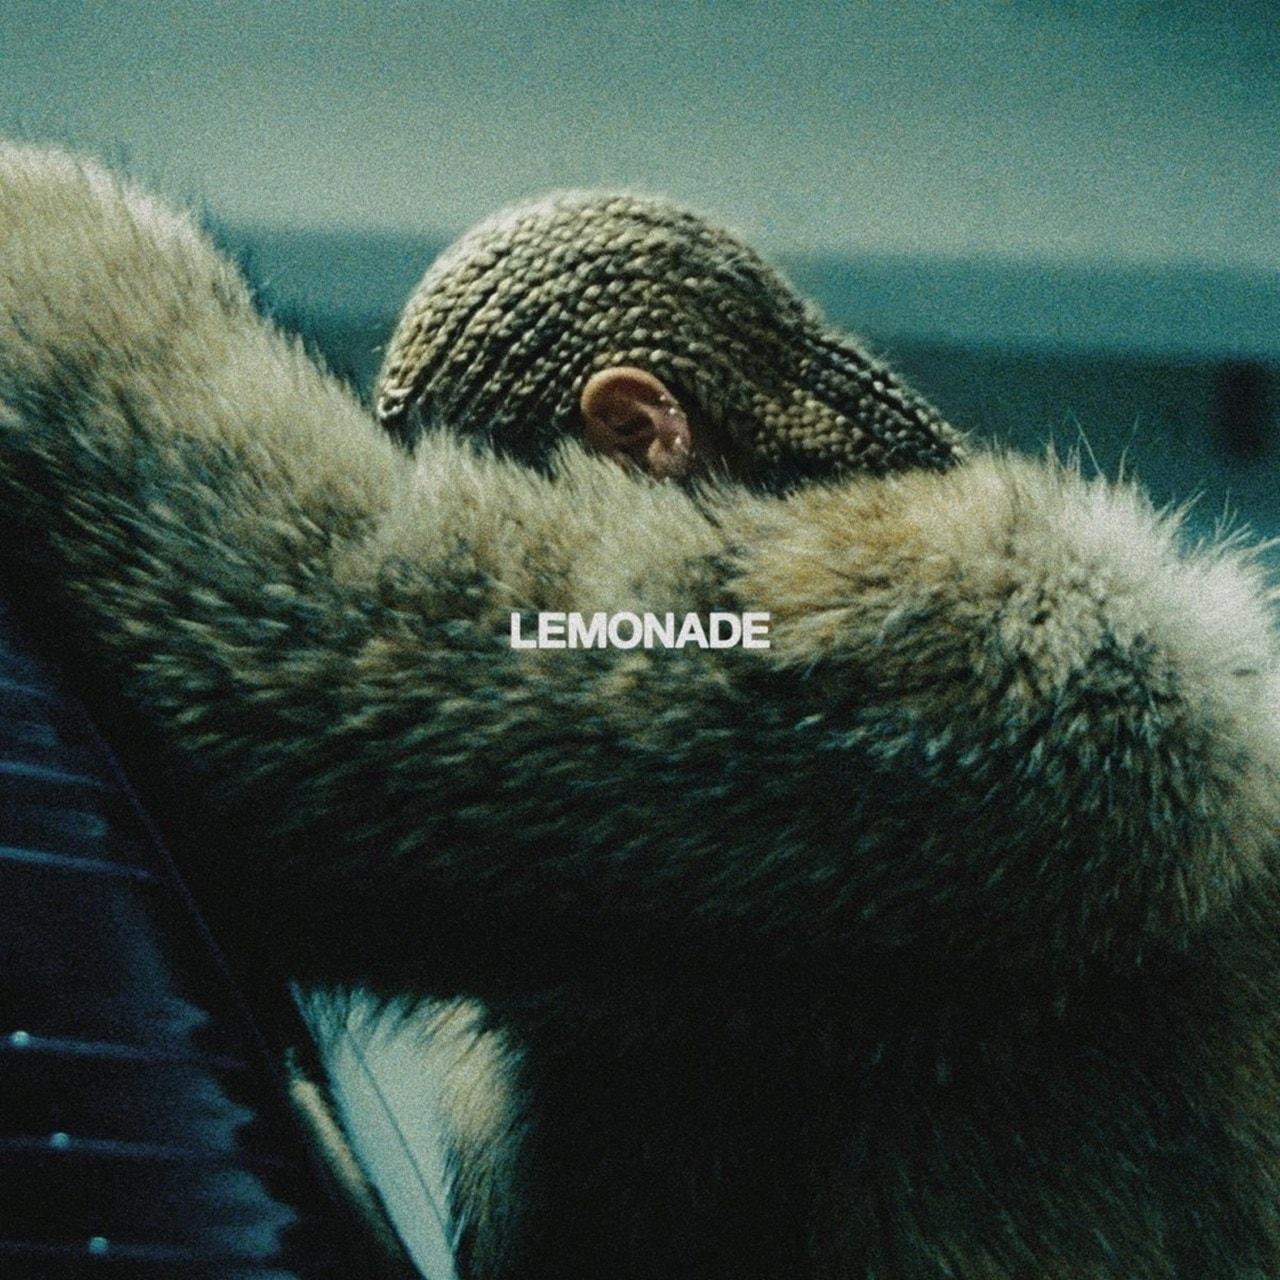 LEMONADE - 1